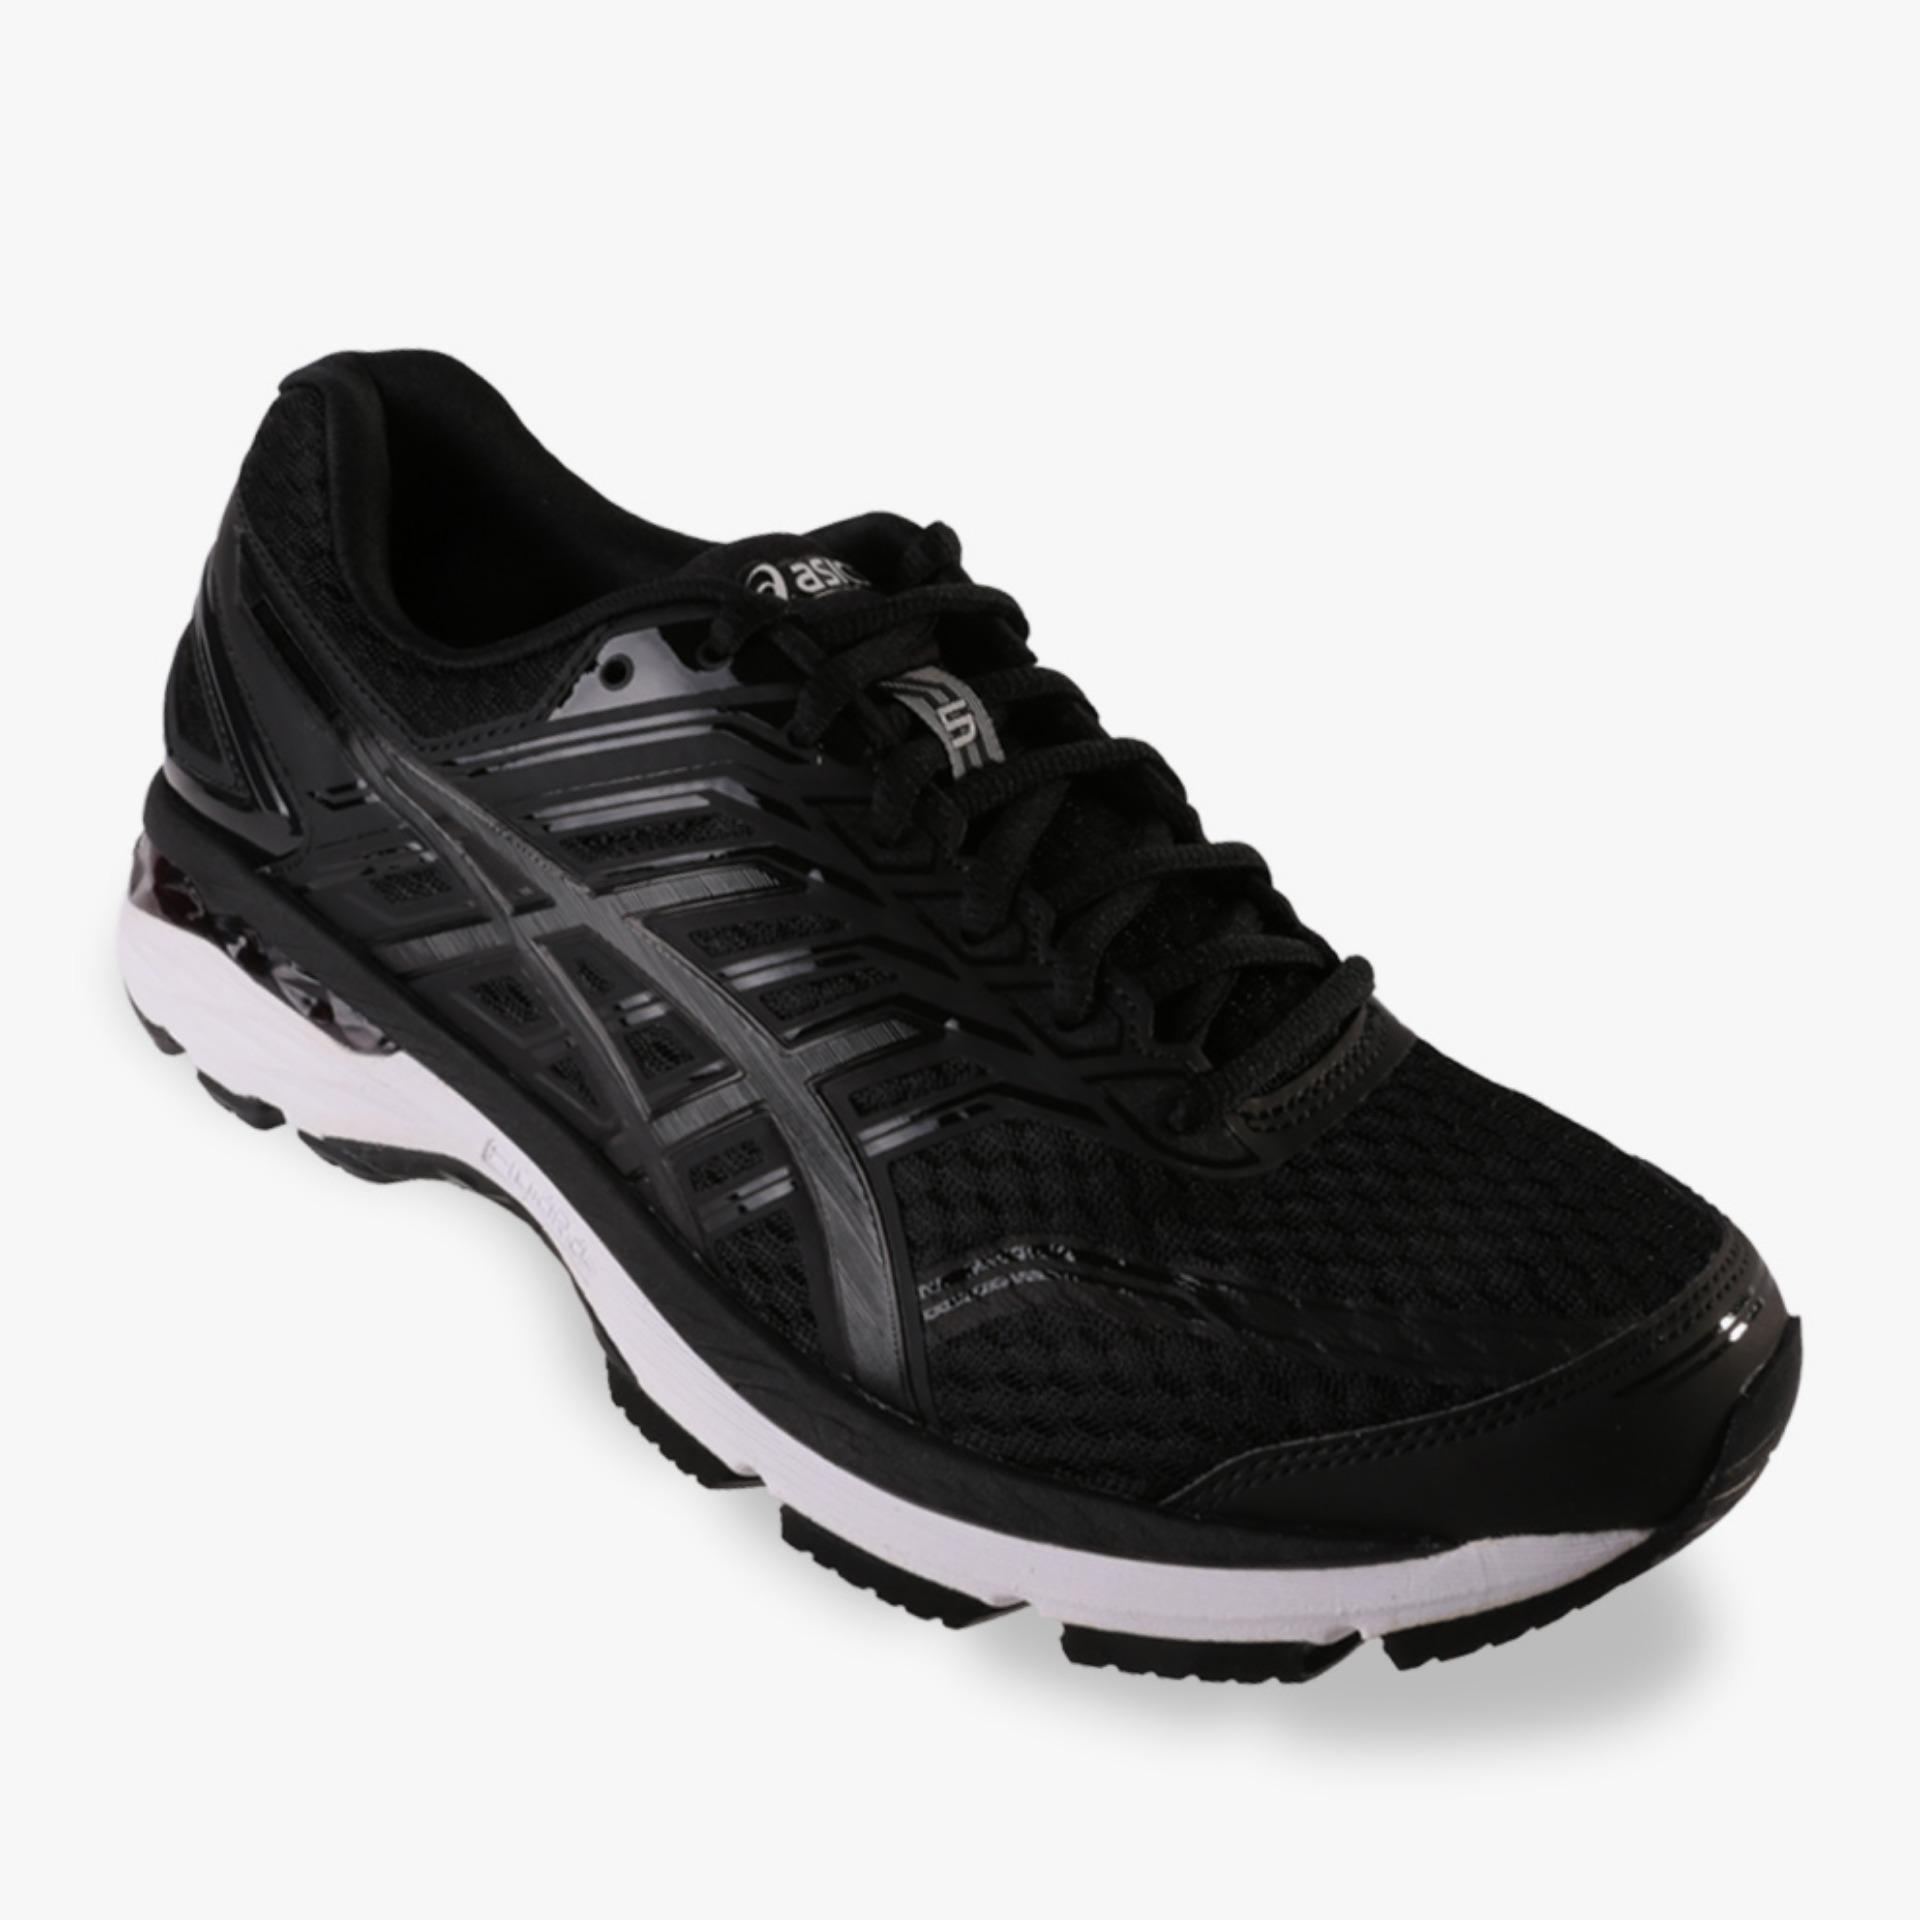 Jual Asics Gt 2000 5 Men S Running Shoes Hitam Indonesia